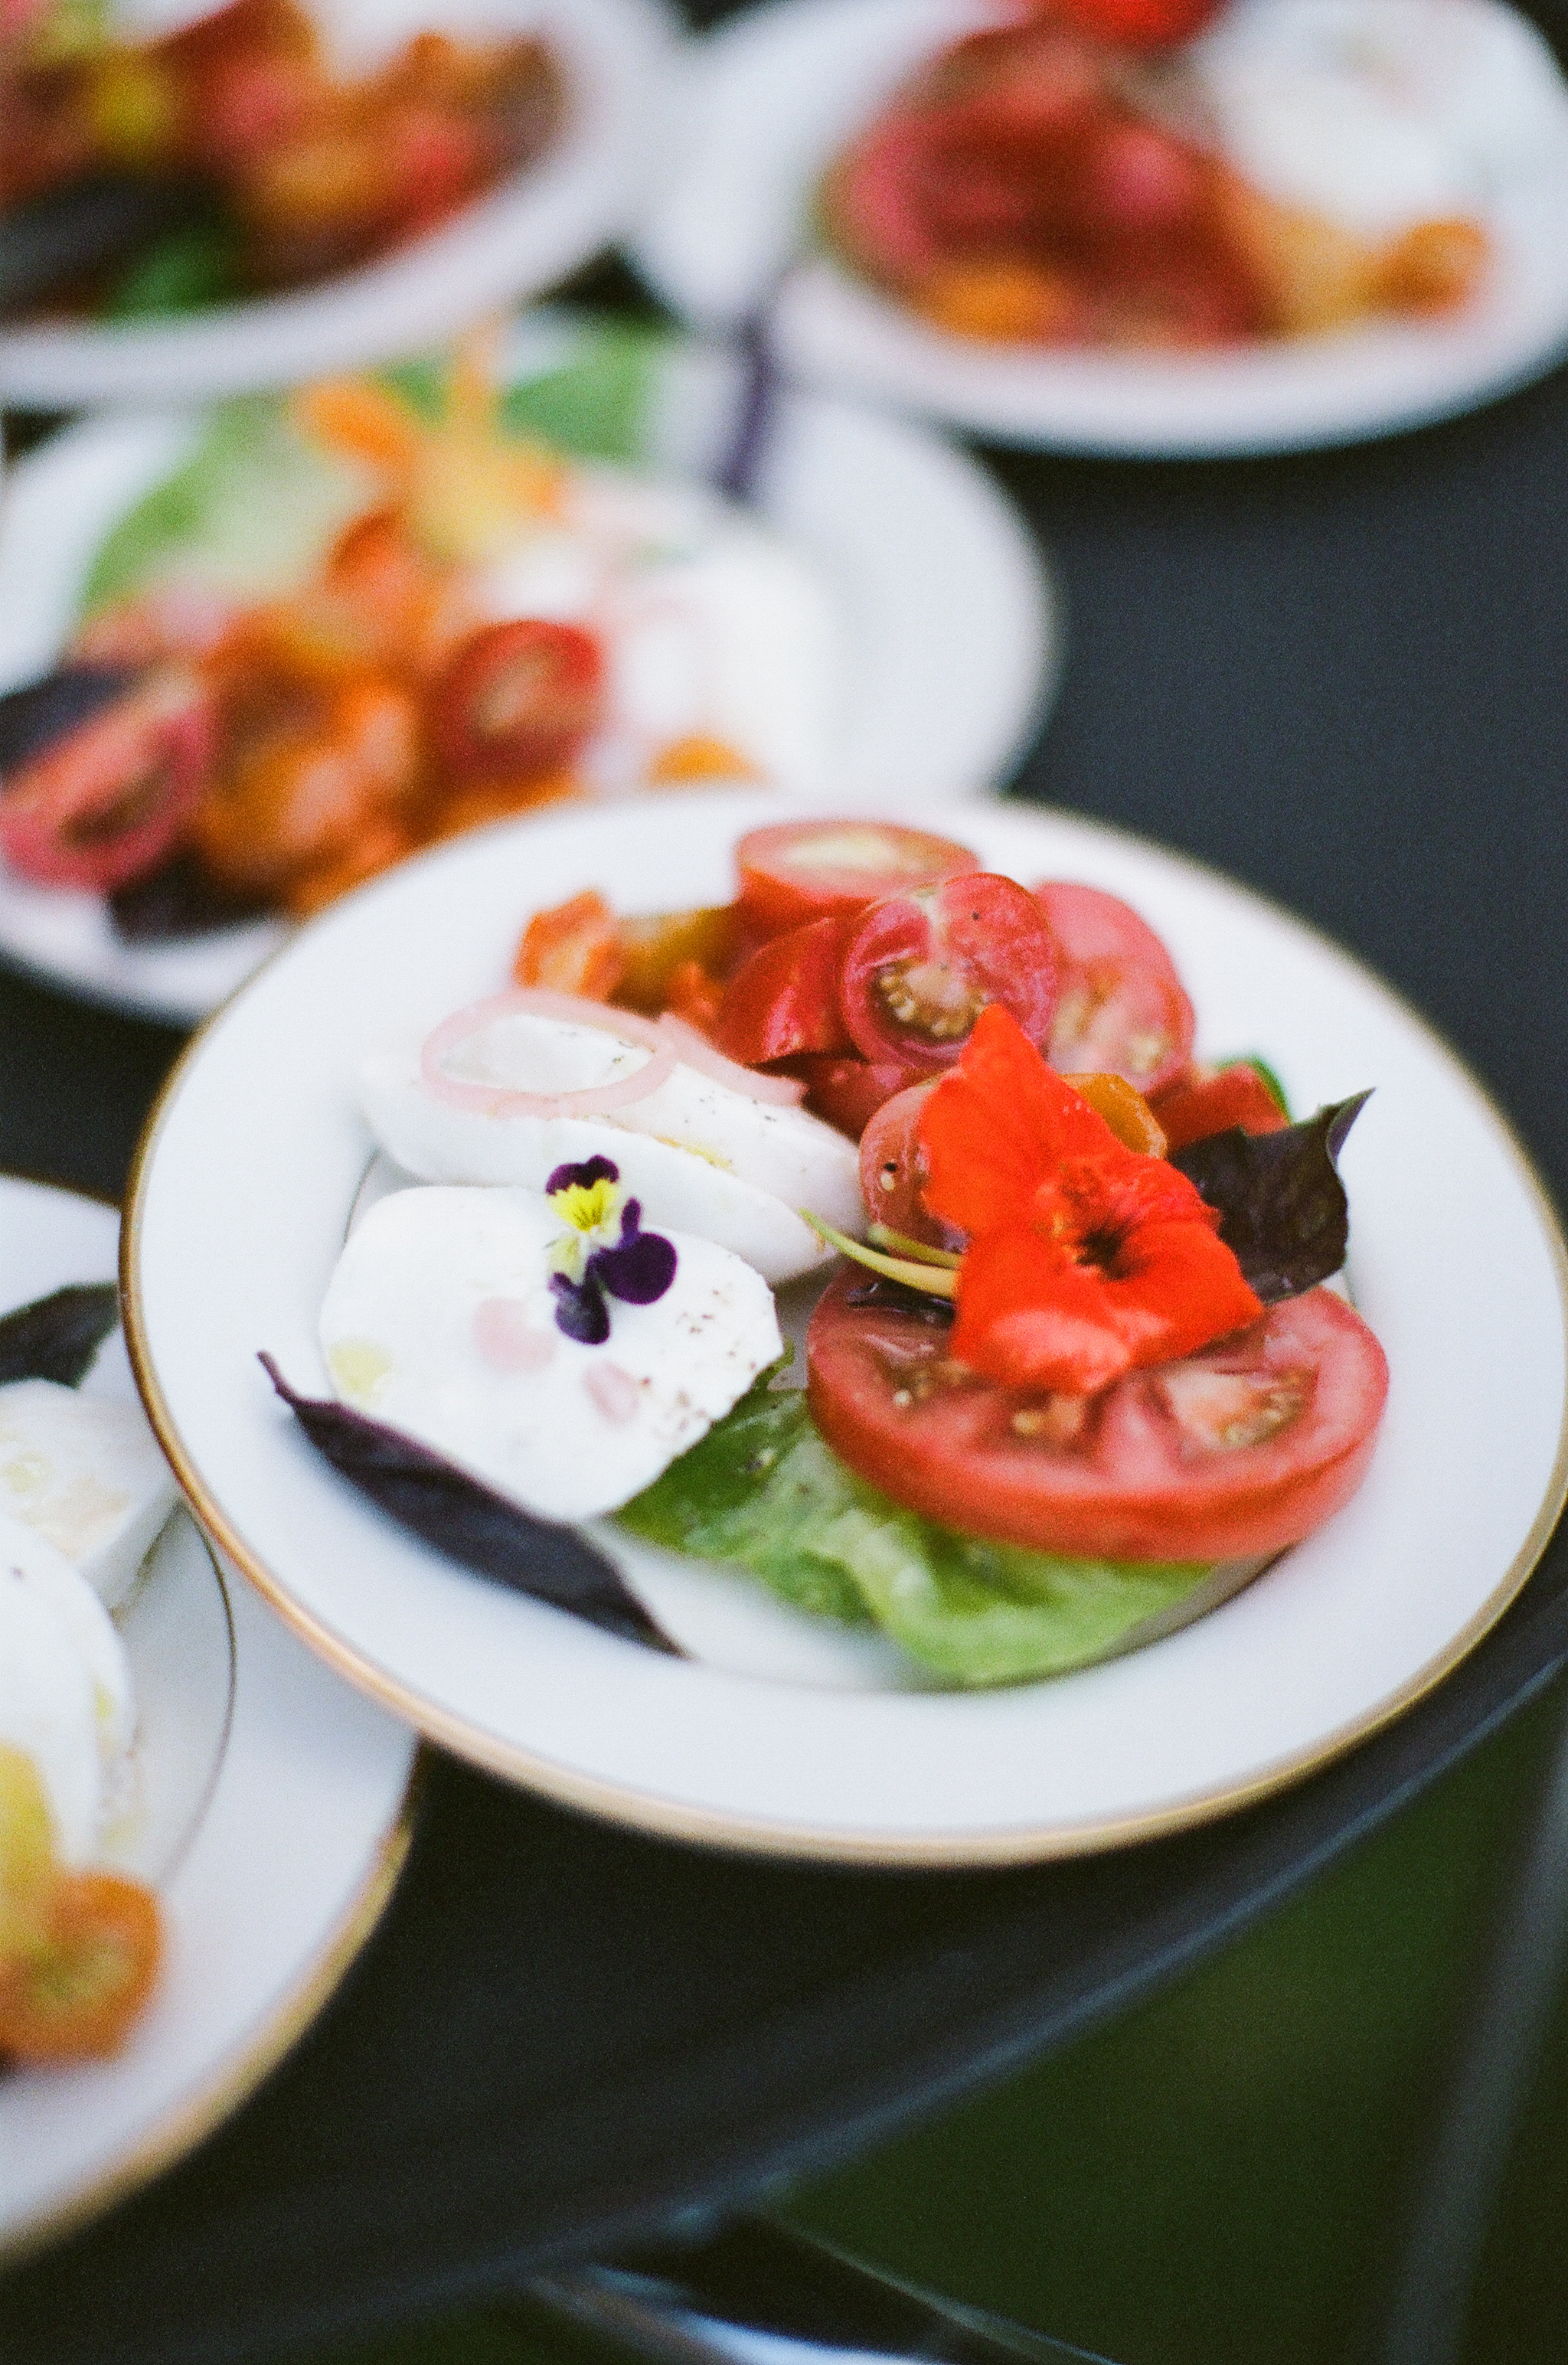 Heirloom Tomatoes with Burrata, Herbs, and Shallot Vinaigrette ©Meredith Perdue